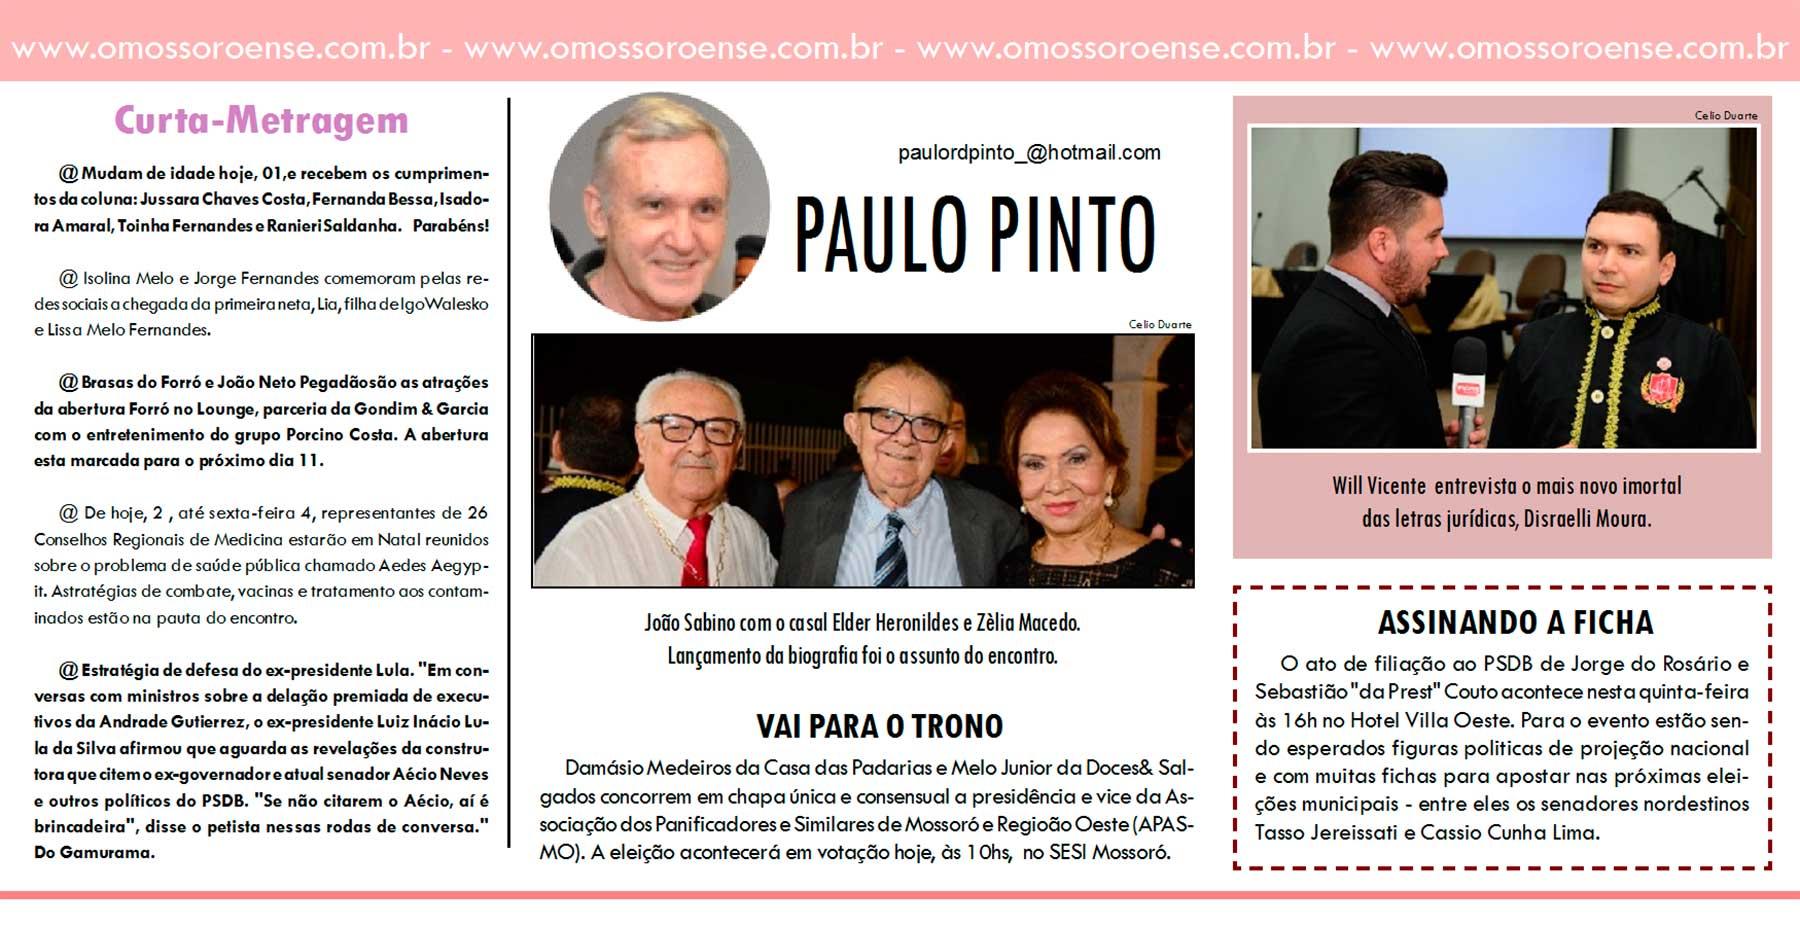 PAULO-PINTO-PC-02-03-16